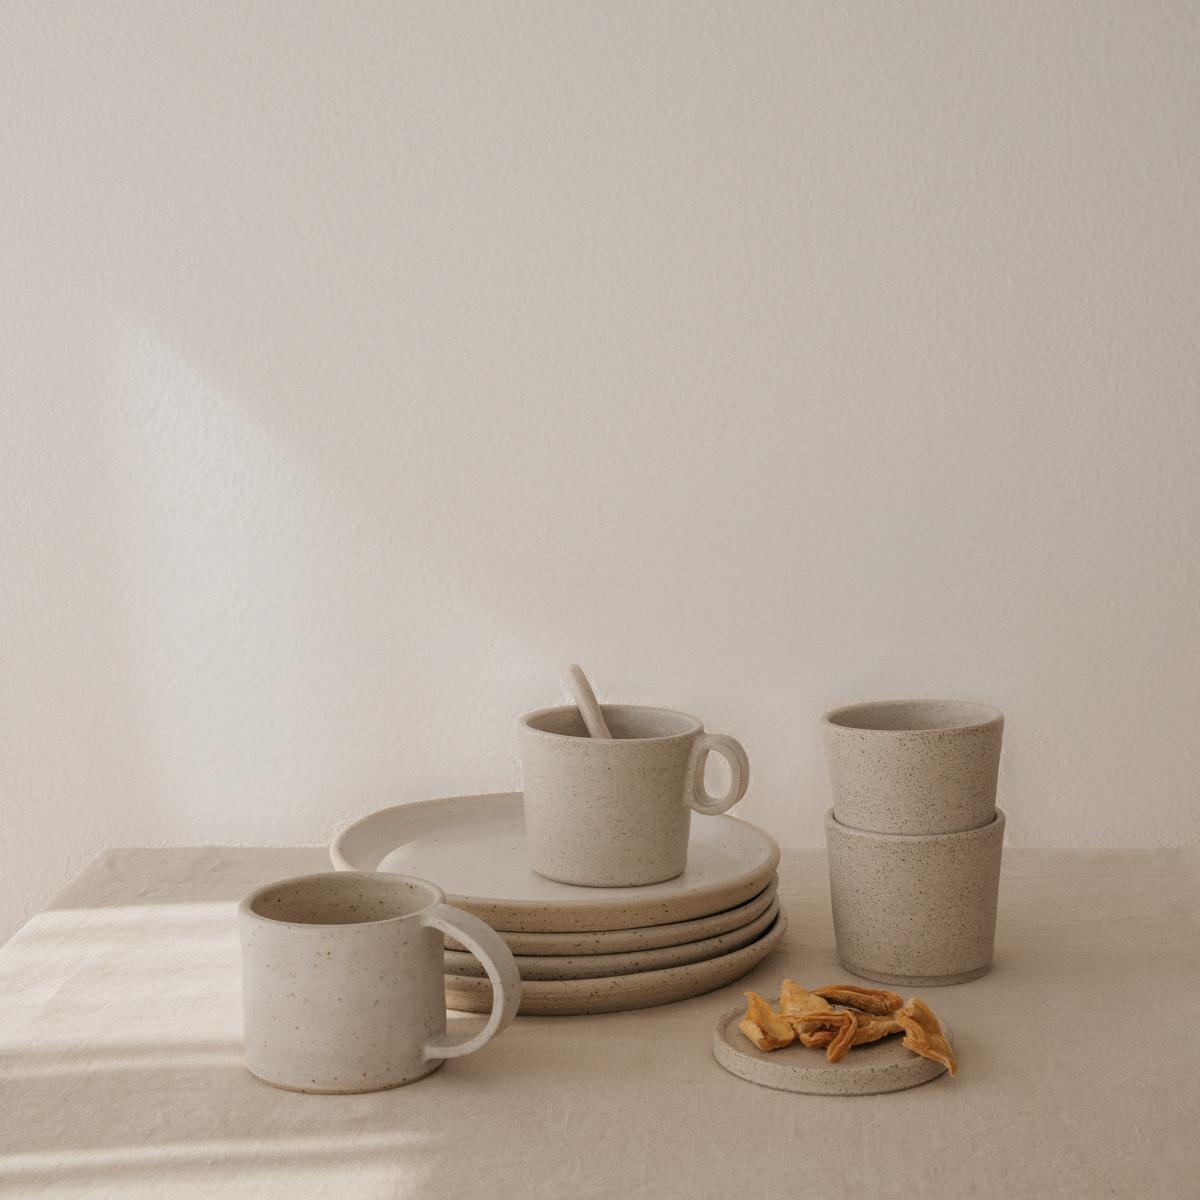 Ceramics by Imre Bergmann